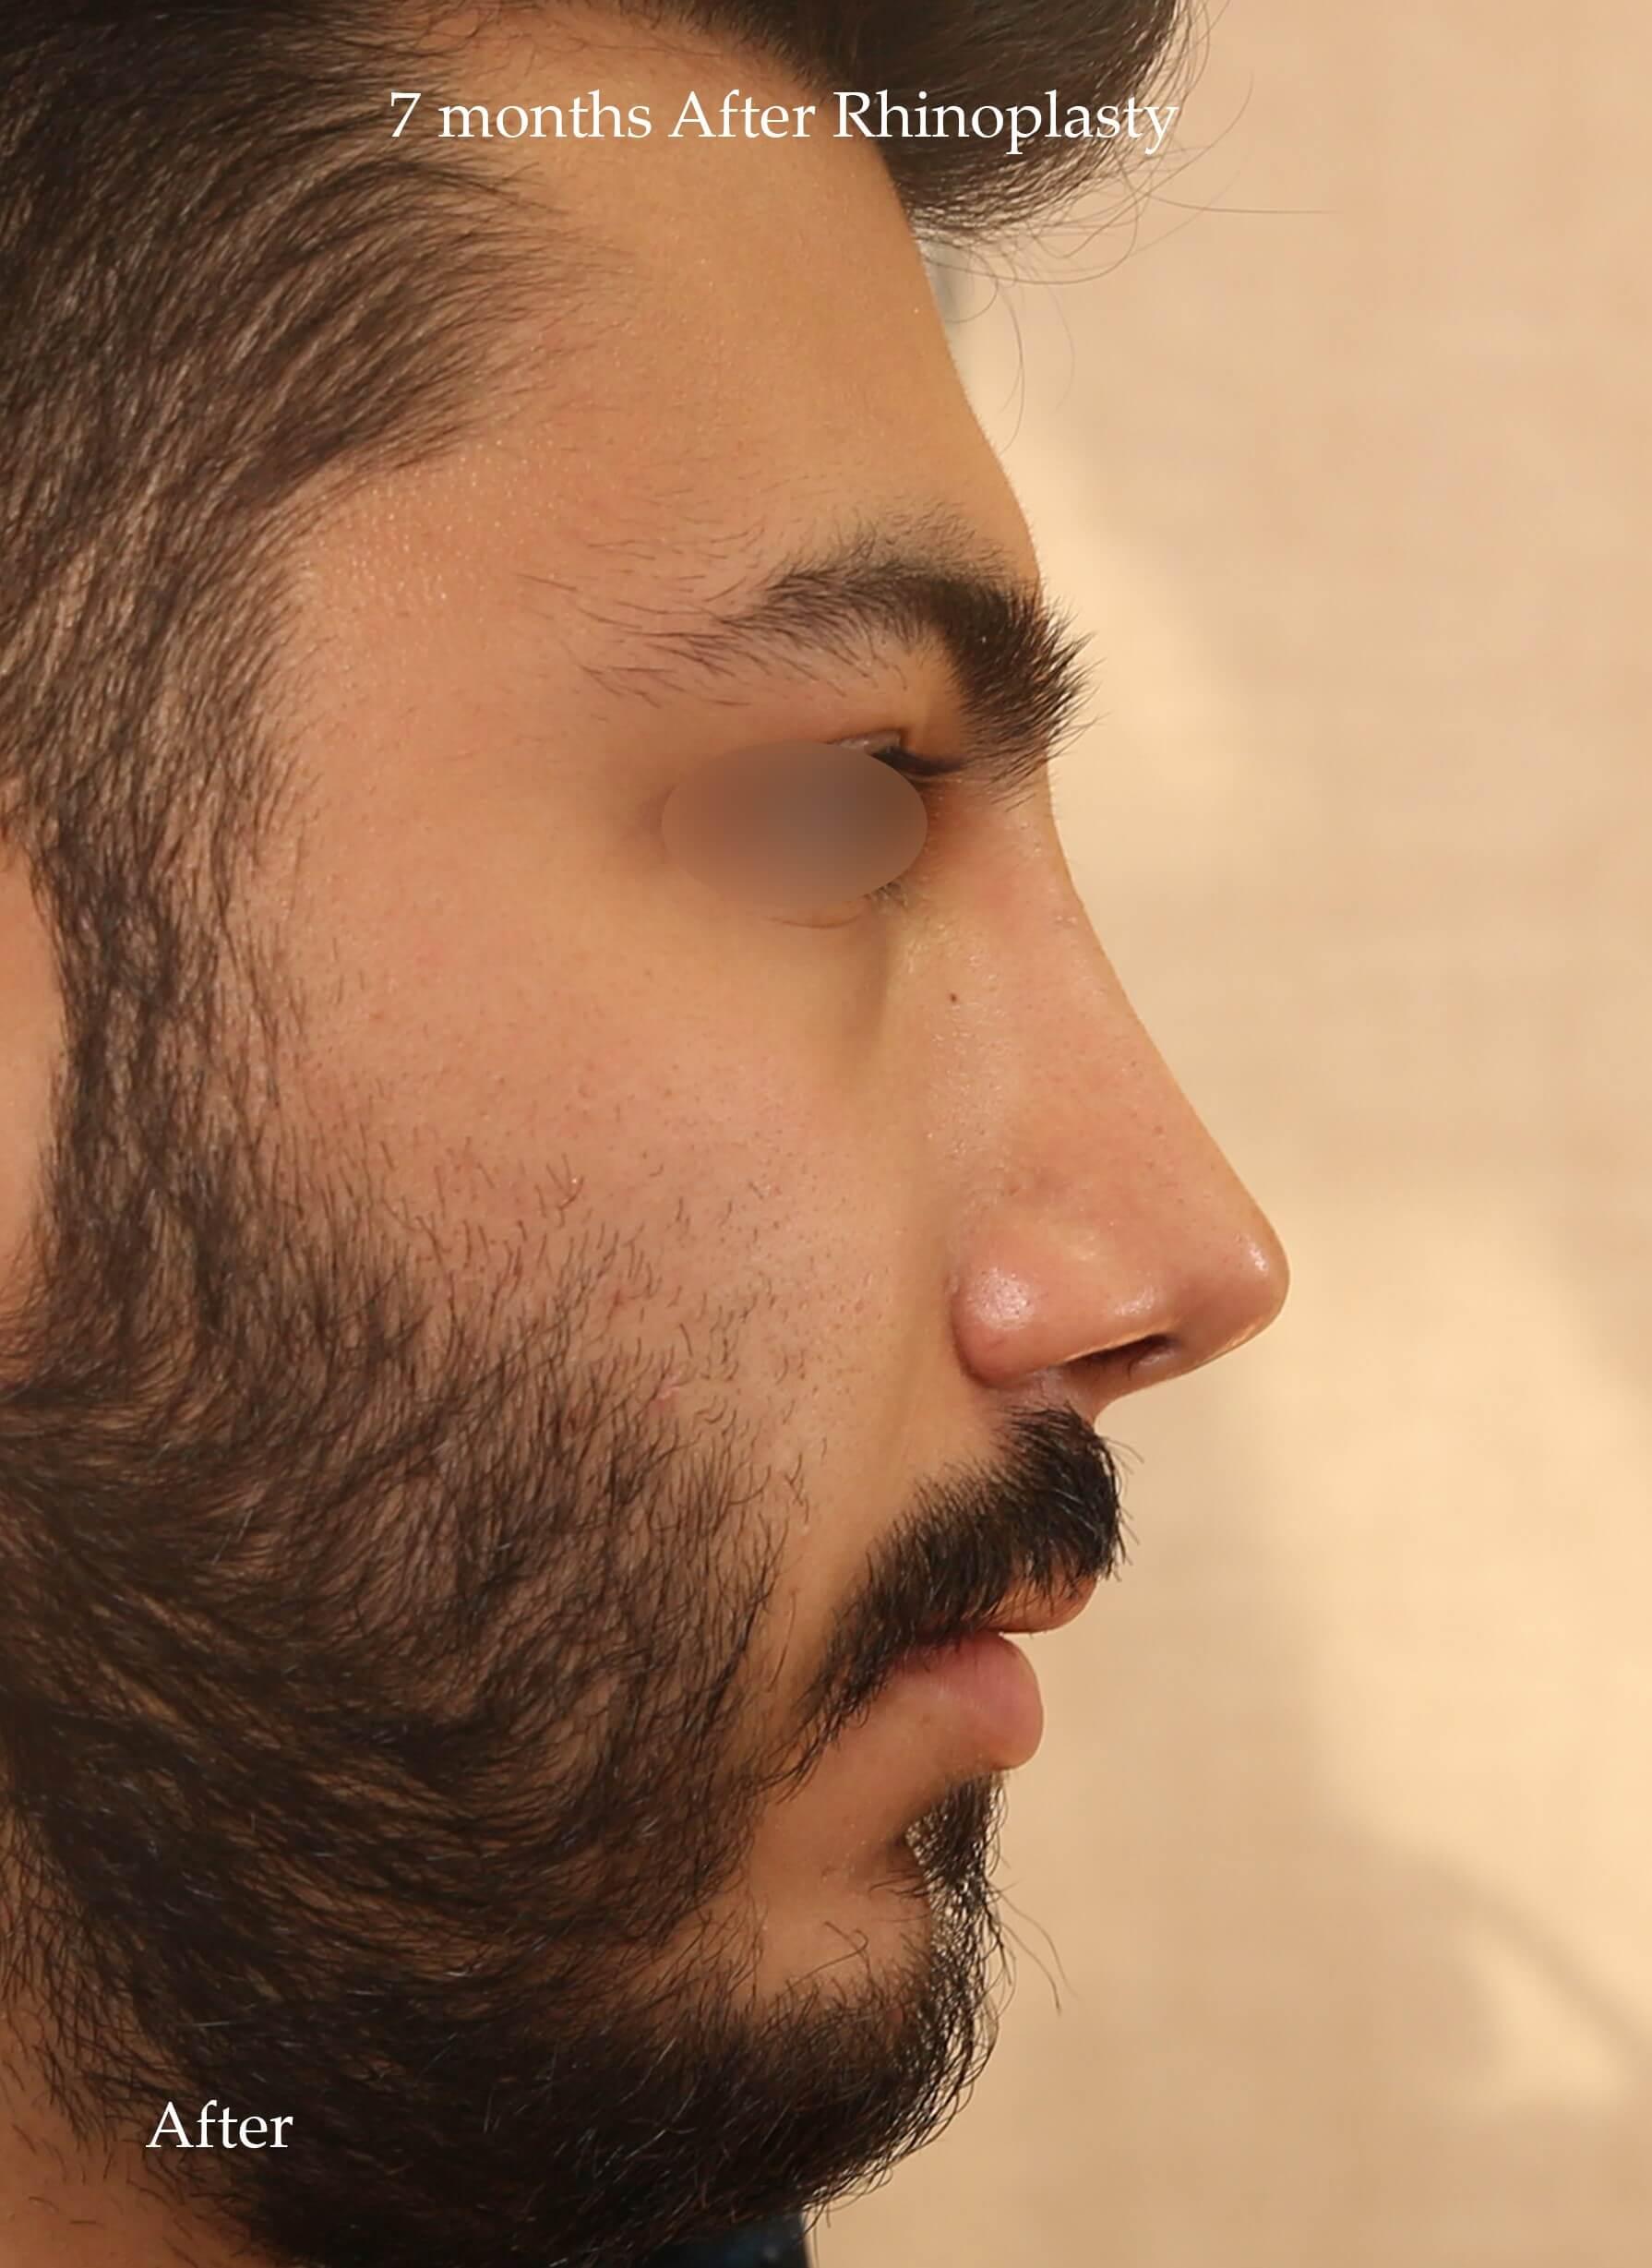 after-rhinoplasty-dr-shahriyar-yahyavi